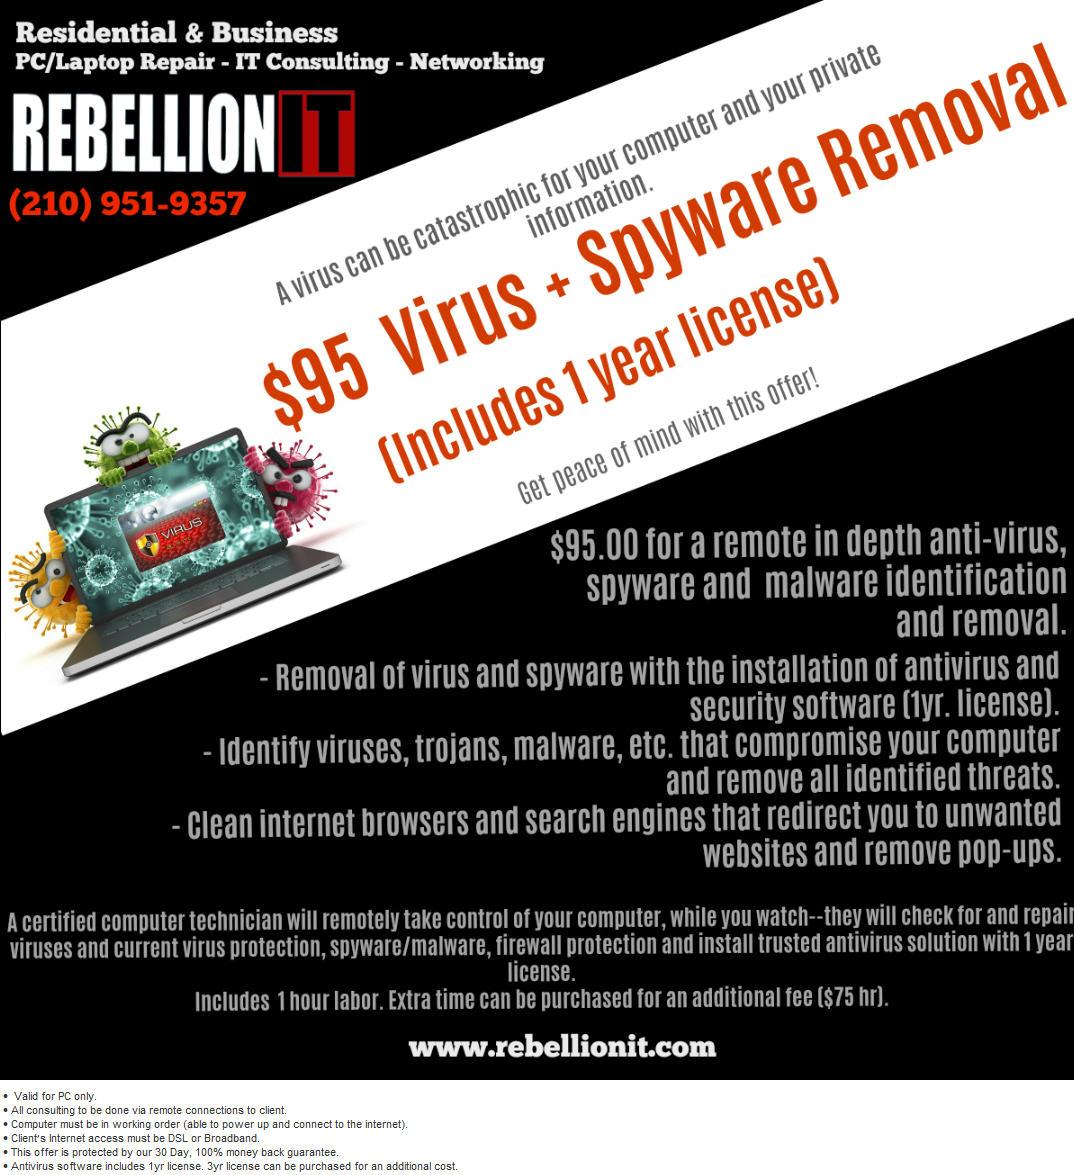 $95 Virus + Spyware Removal